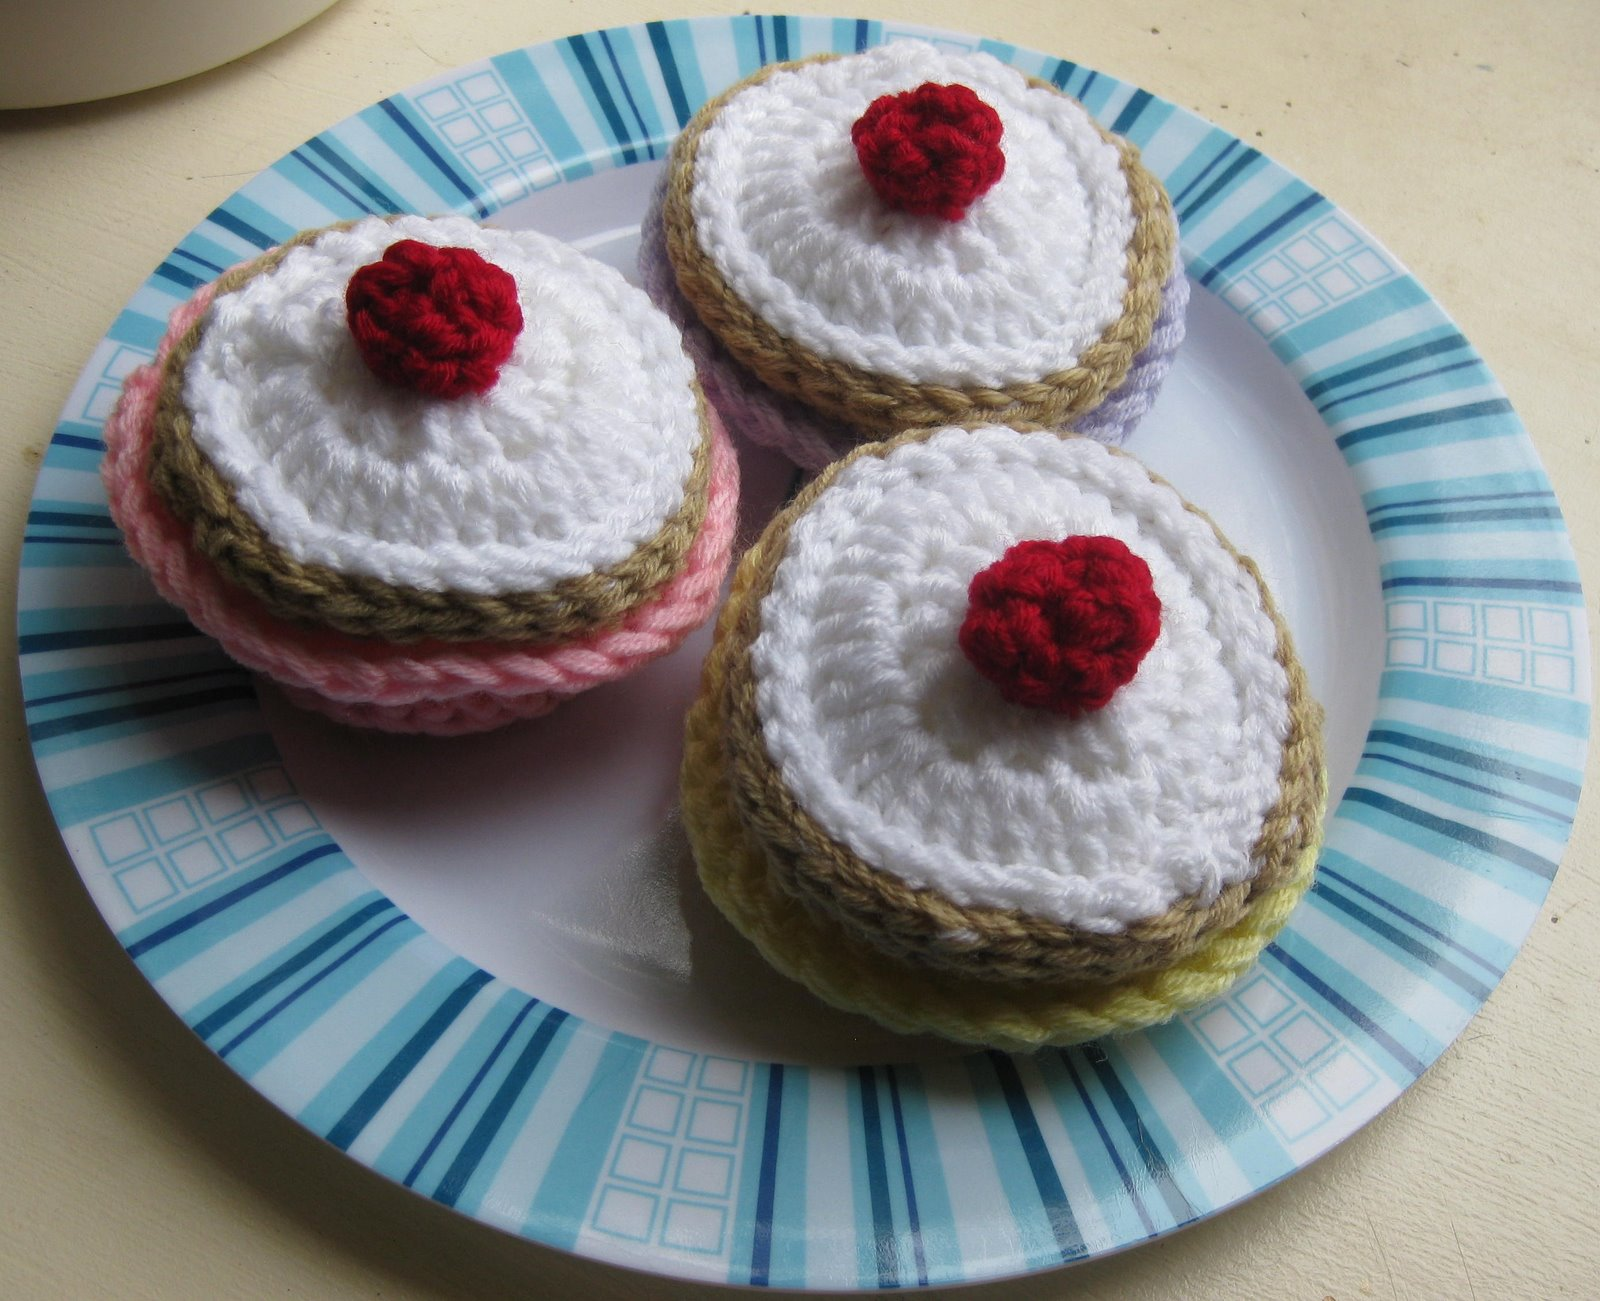 [bigcakes.jpg]